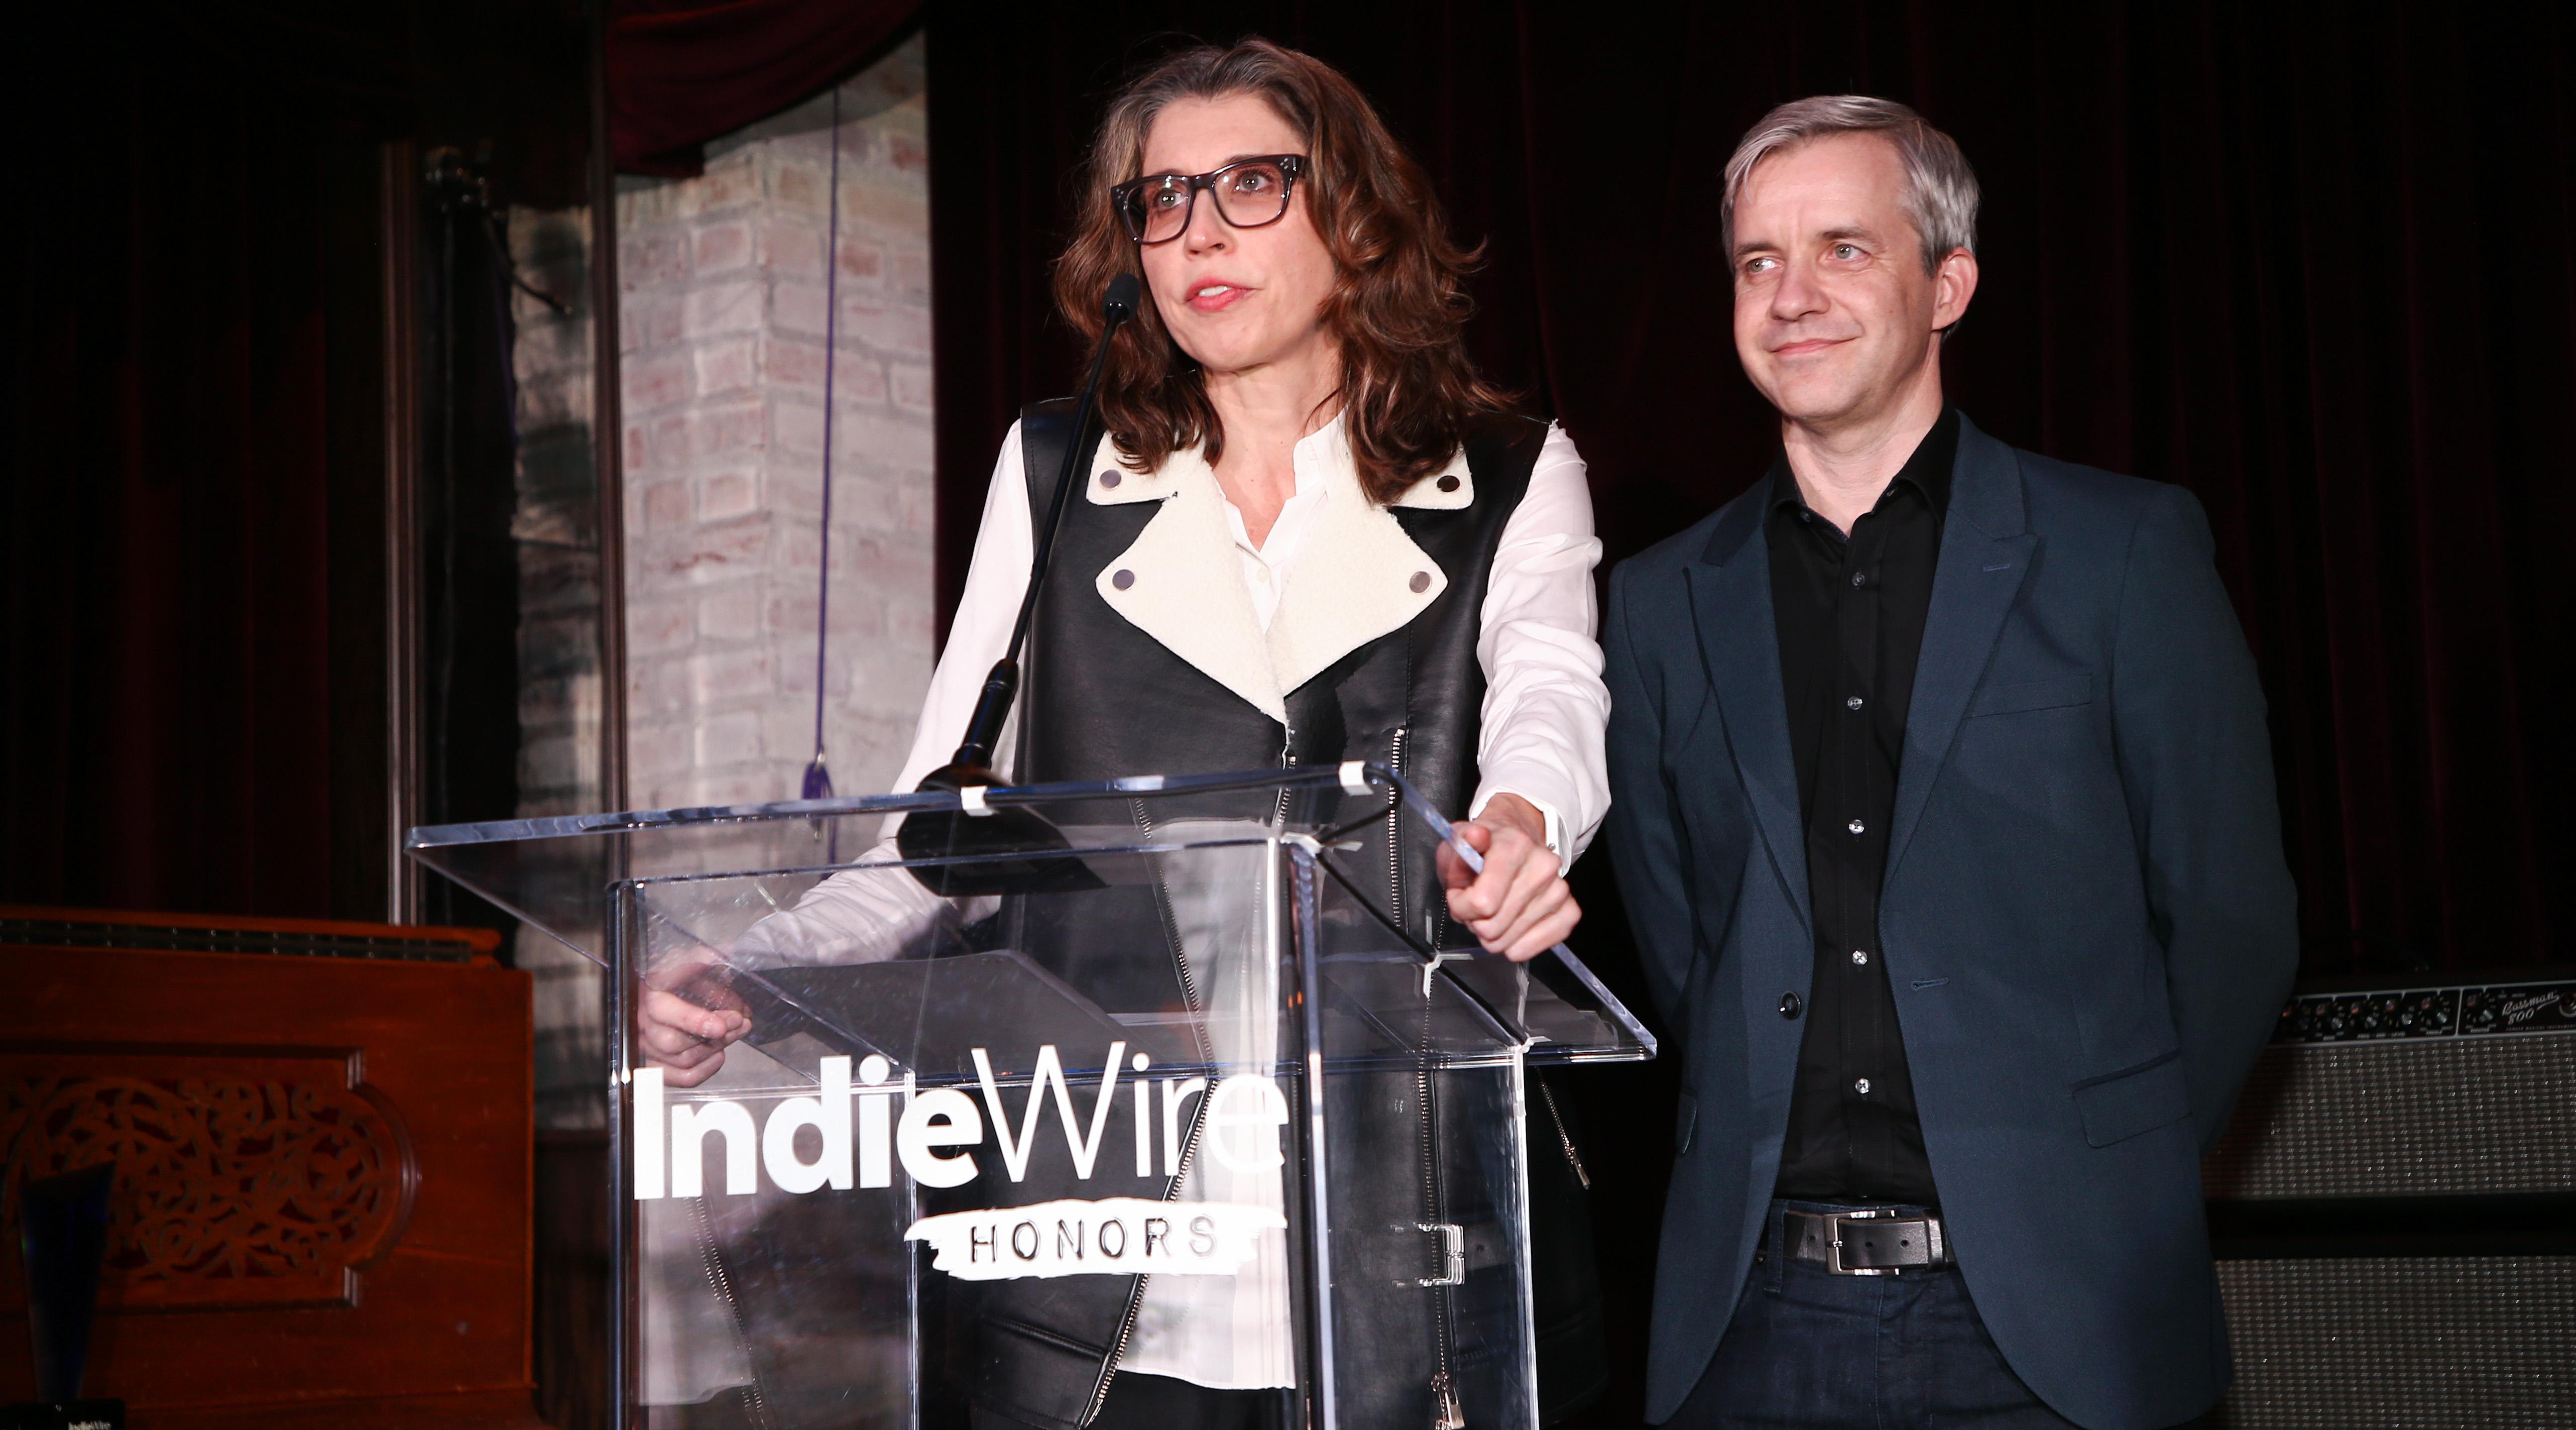 Dana Harris and James IsraelIndiewire Honors, Inside, Los Angeles, USA - 02 Nov 2017